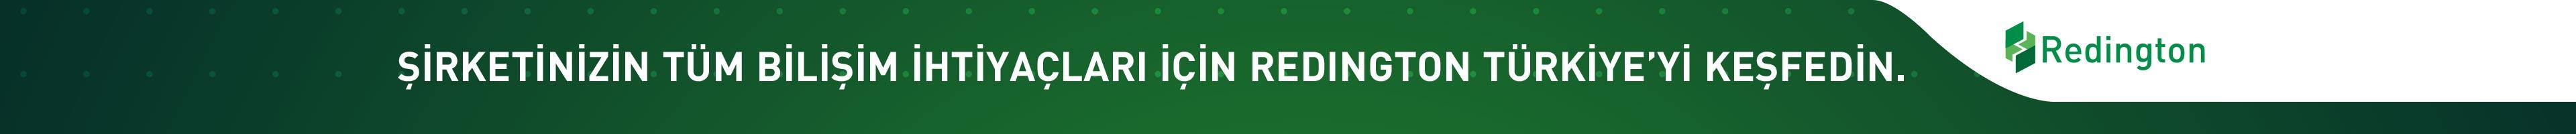 Redington reklamı